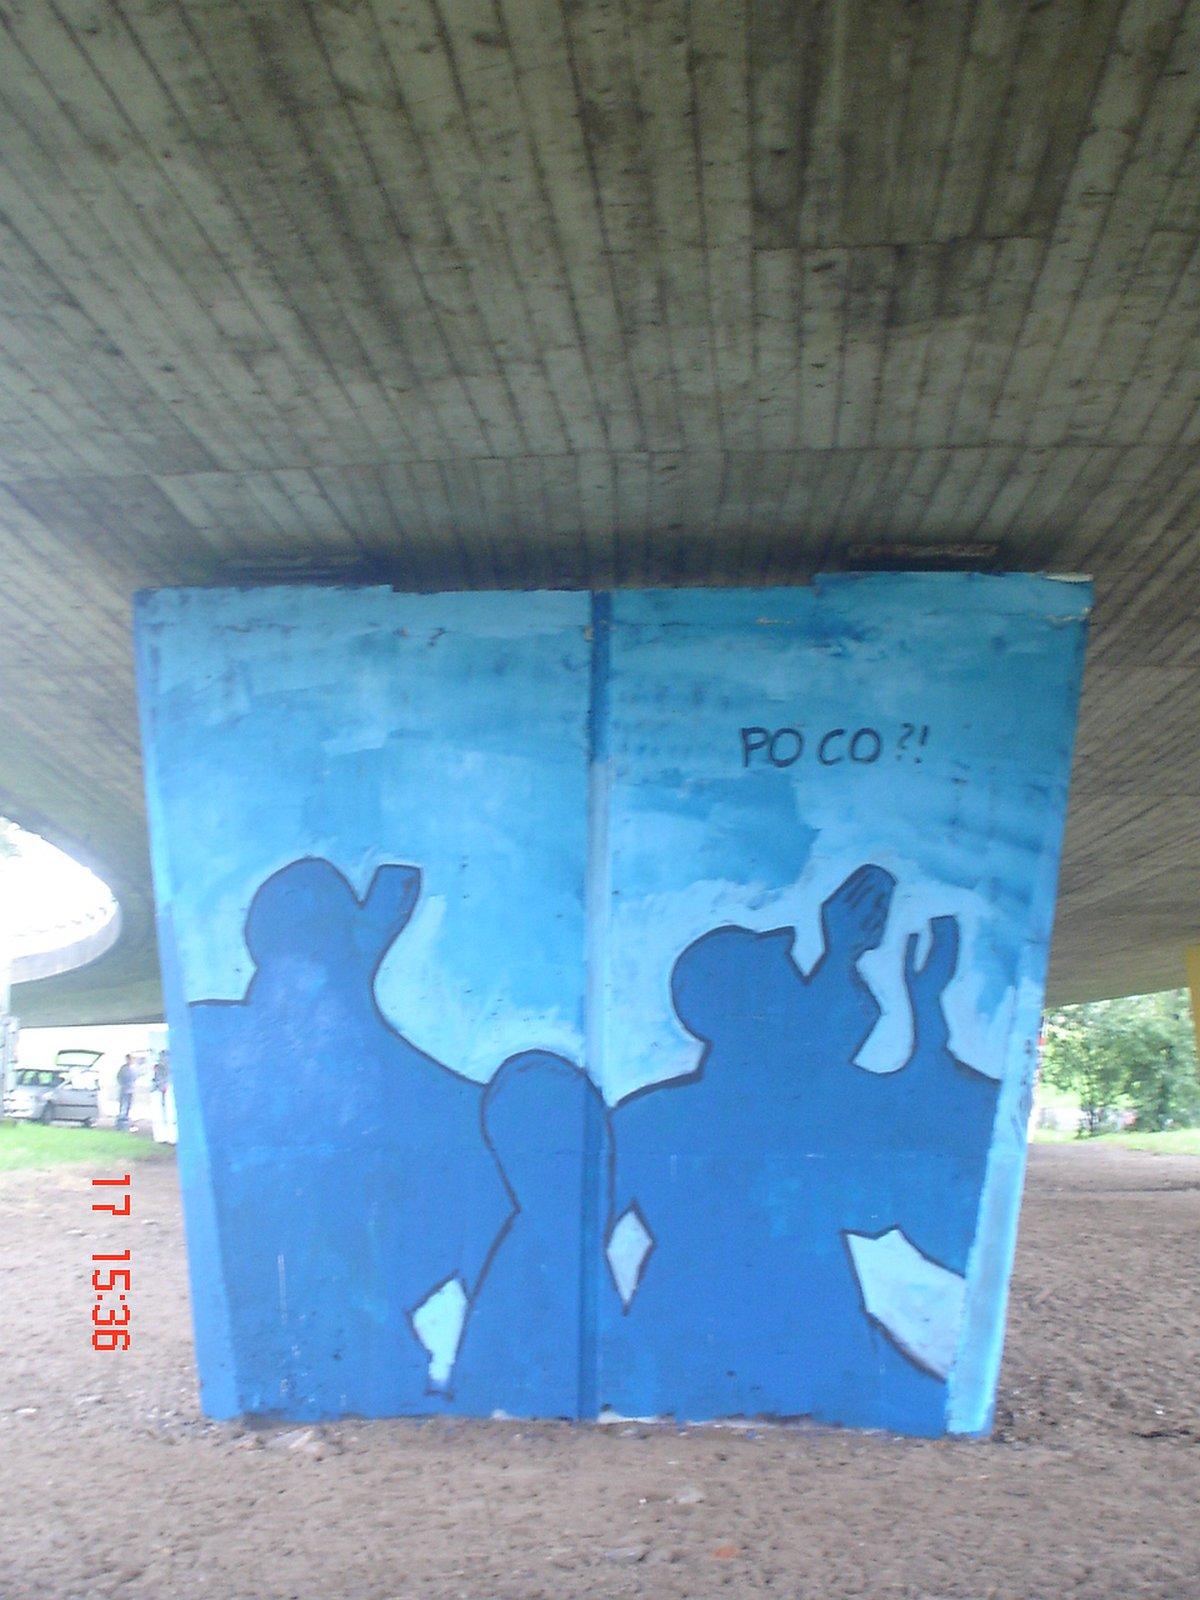 Po co? / Mural Festival 2008, Gdańsk